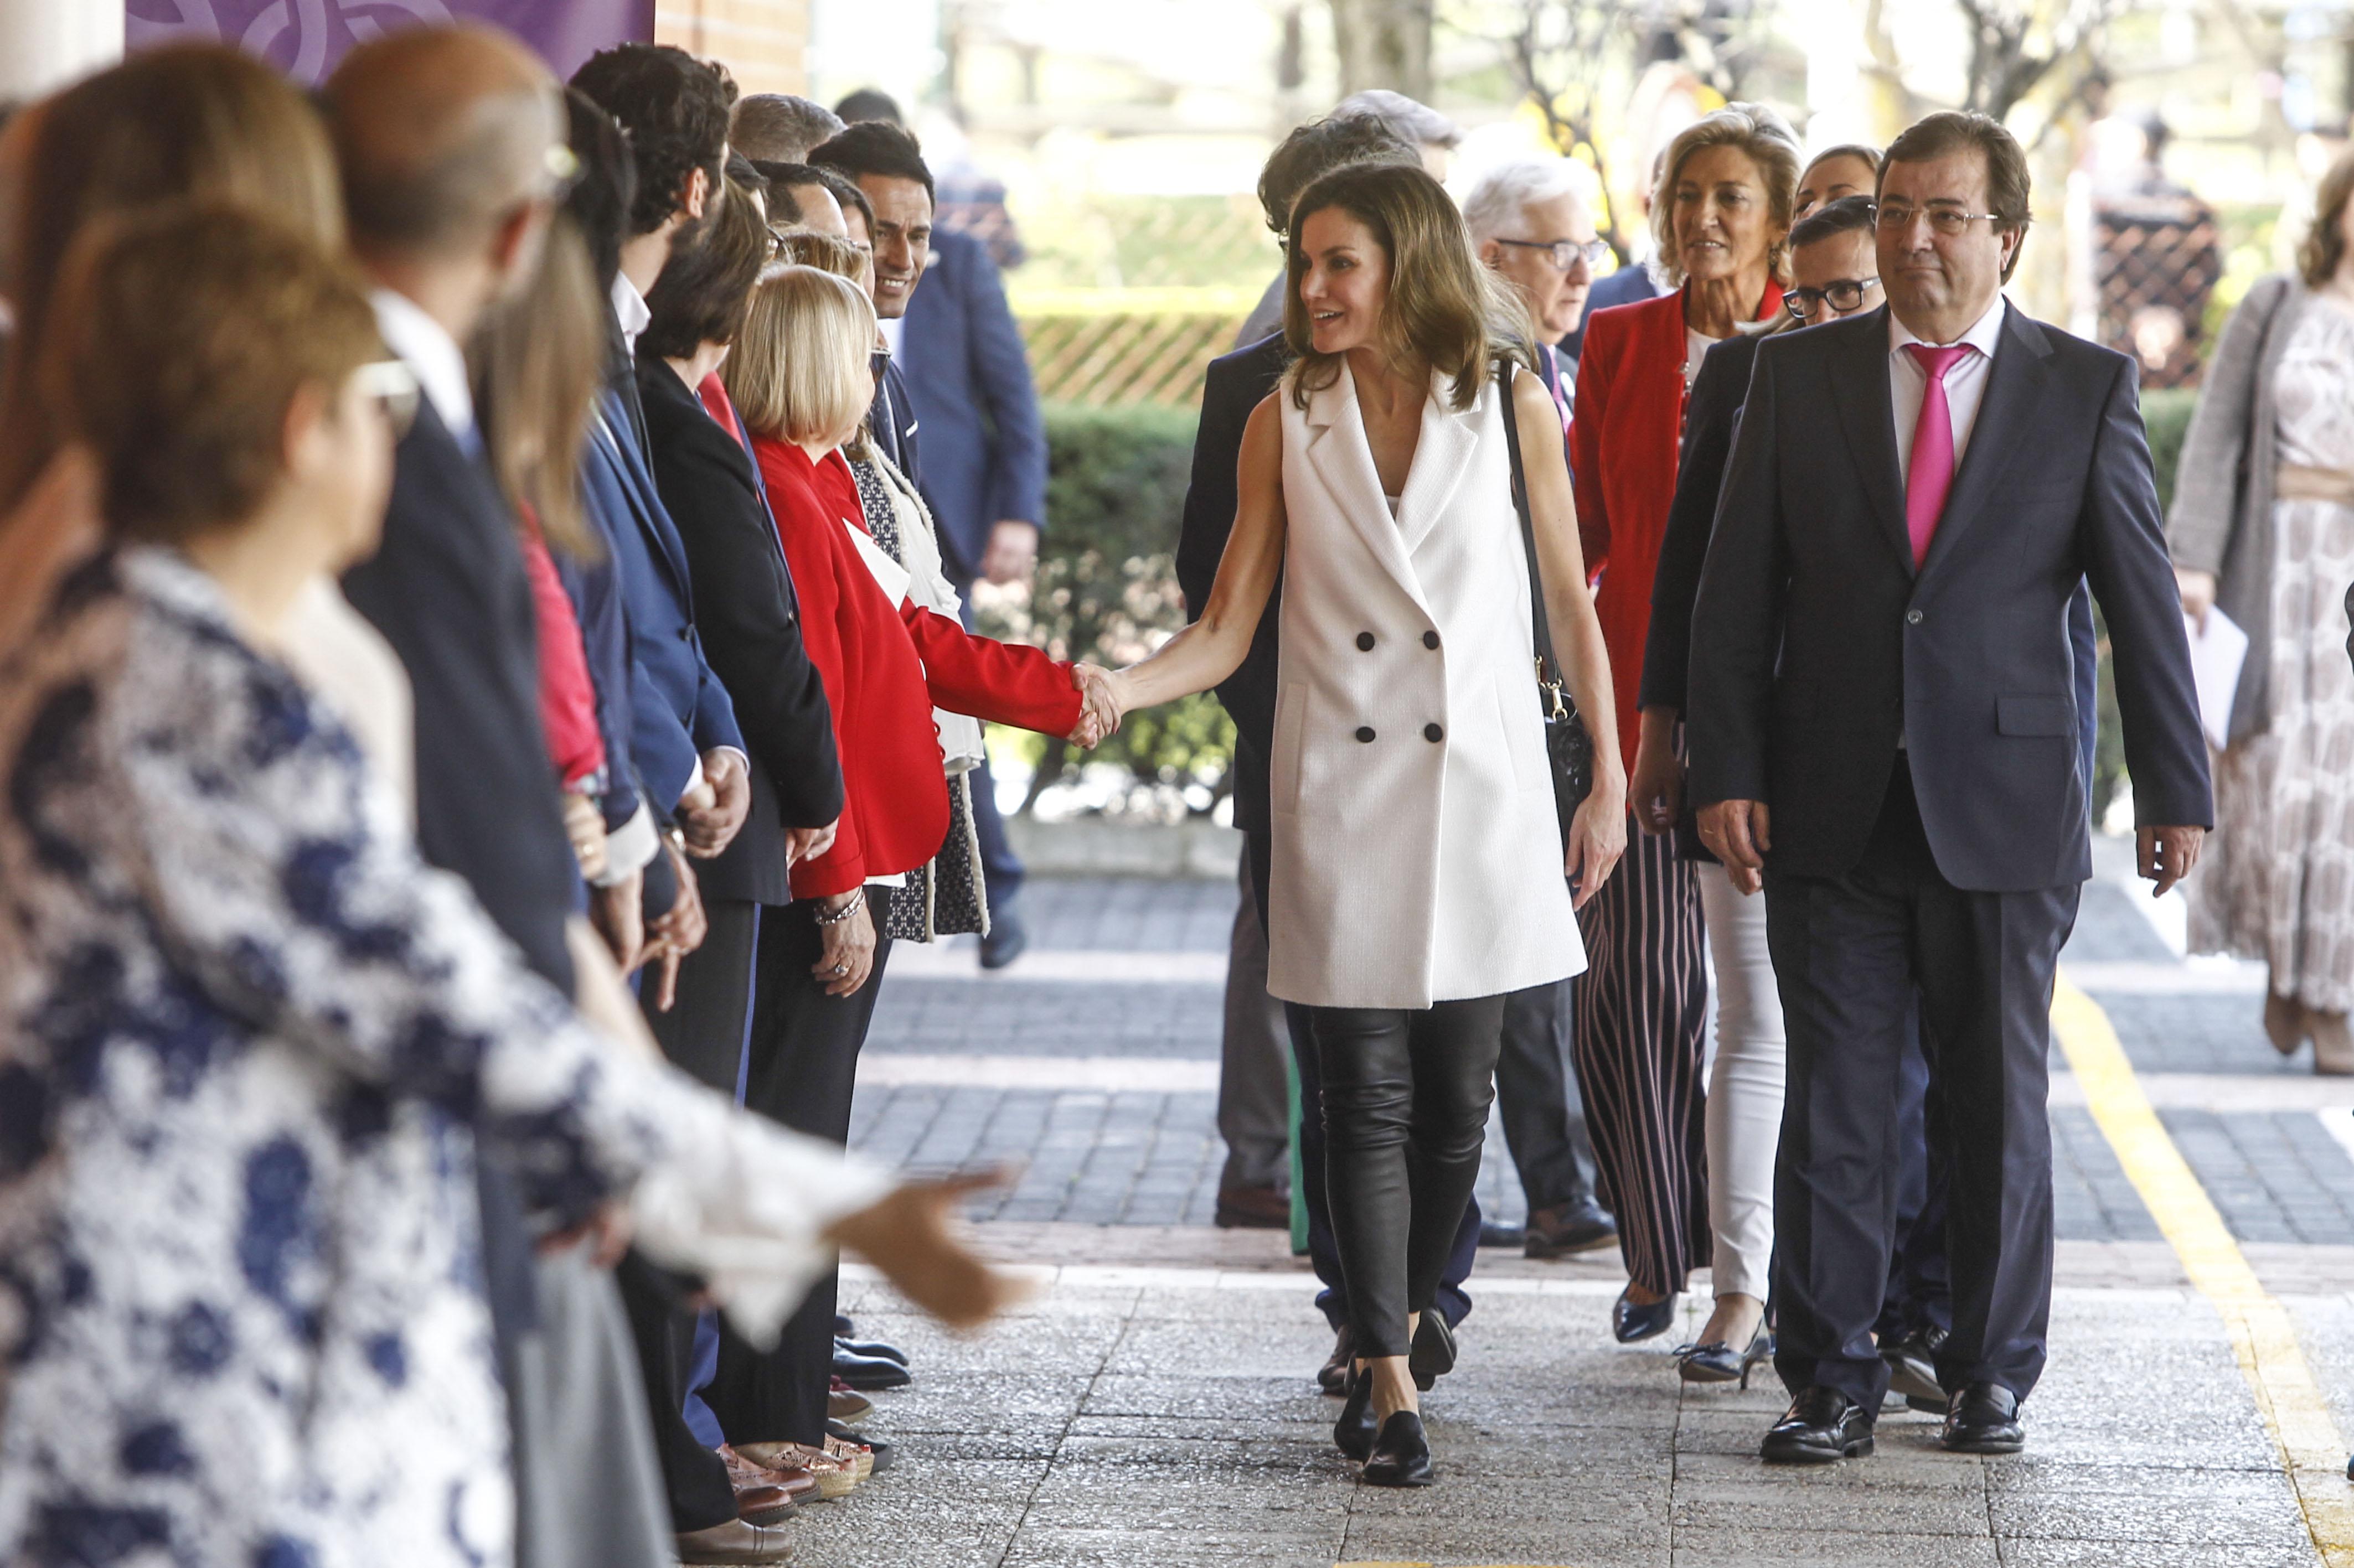 Queen Letizia attends the opening of the 5th Congress of rare diseases at Pedro de Valdivia high school in Villanueva de la Serena, Spain. <P> Pictured: Queen Letizia <B>Ref: SPL1687792  260418  </B><BR/> Picture by: Michael Murdock / Splash News<BR/> </P><P> <B>Splash News and Pictures</B><BR/> Los Angeles:310-821-2666<BR/> New York:212-619-2666<BR/> London:870-934-2666<BR/> <span id=